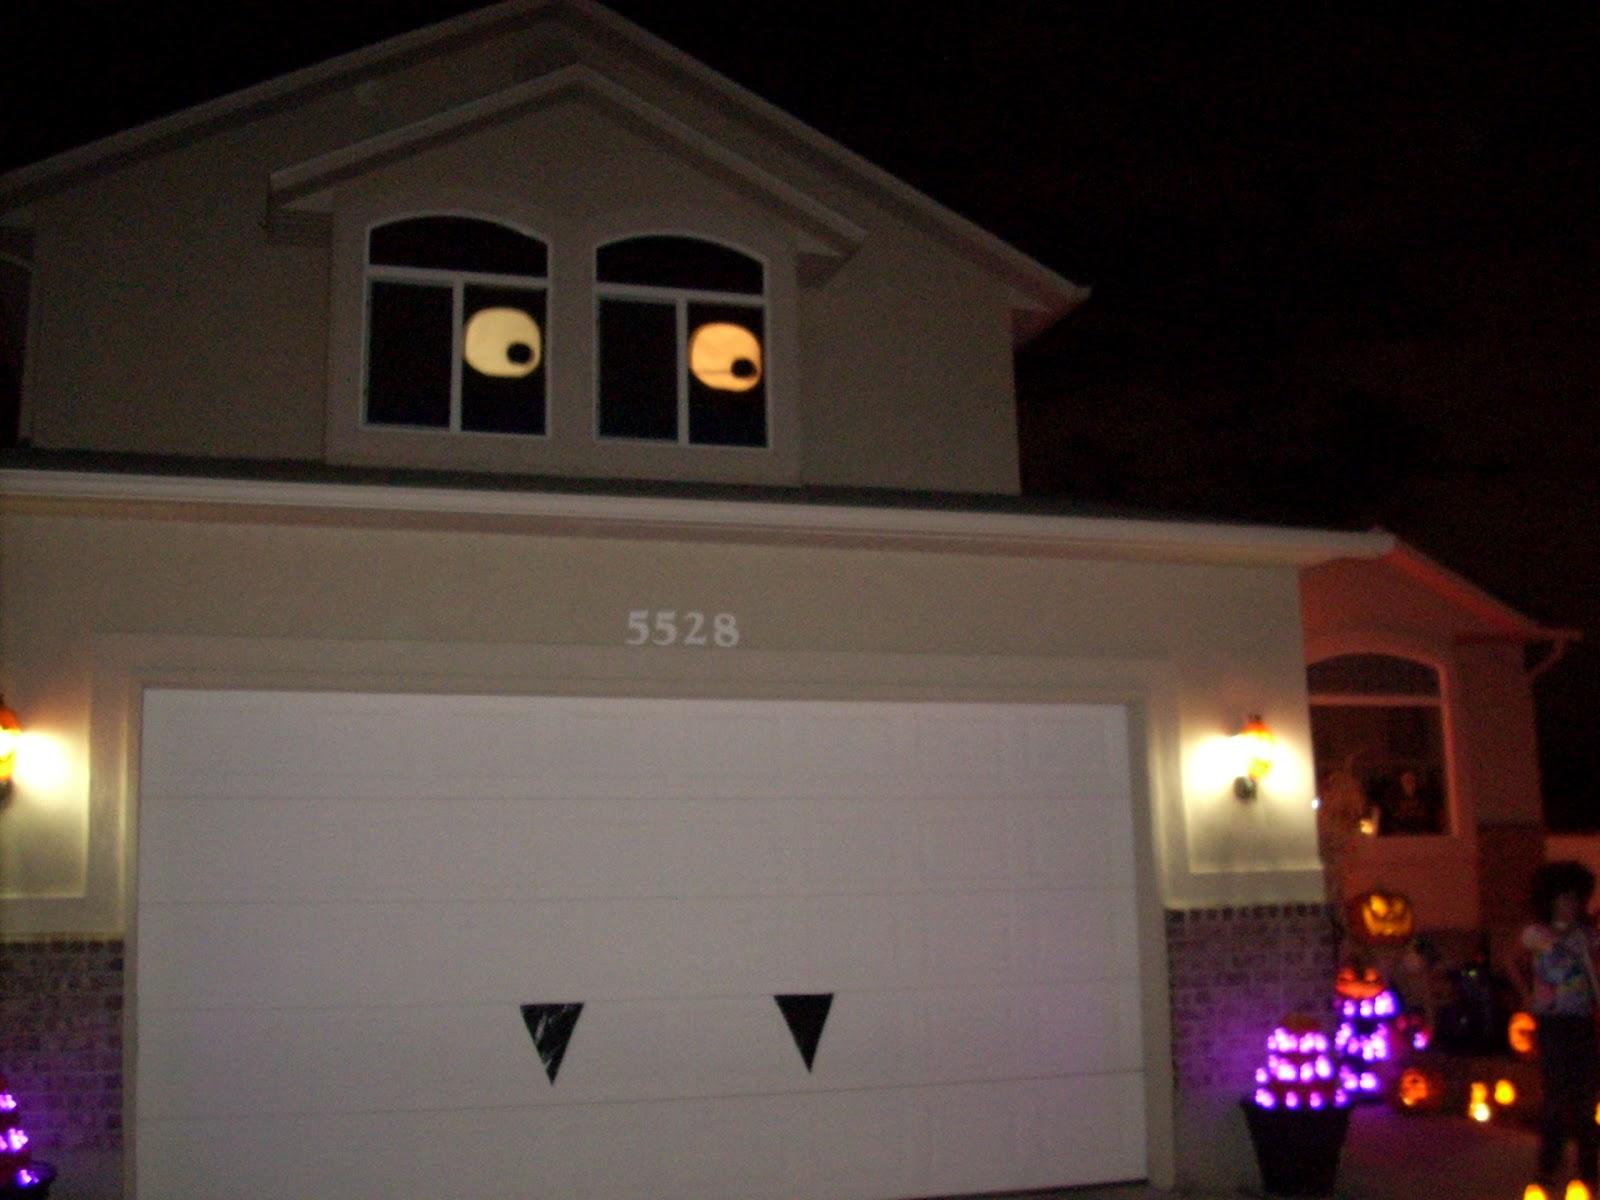 Homemade halloween window decorations - Homemade Halloween Window Decorations 33